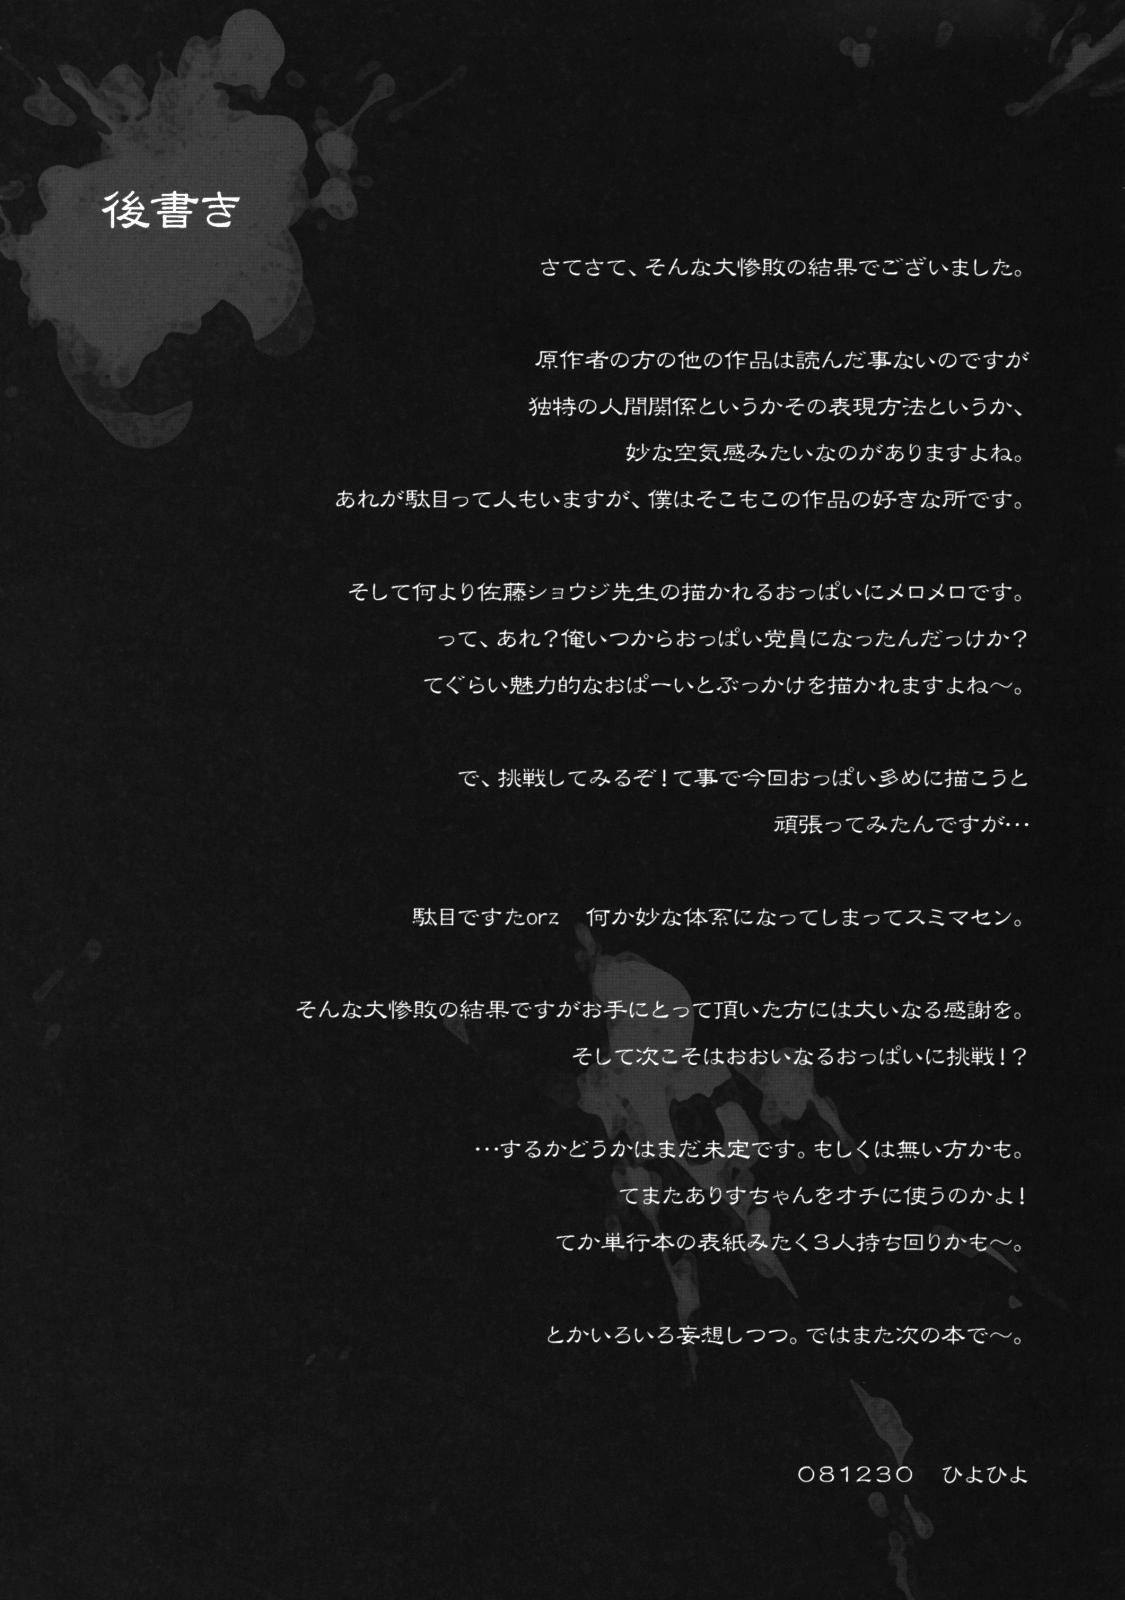 (C75) [Kashiwa-ya (Hiyo Hiyo)] D[O]HOTD3 D.A.T. (HIGHSCHOOL OF THE DEAD) [English] =LWB= 16